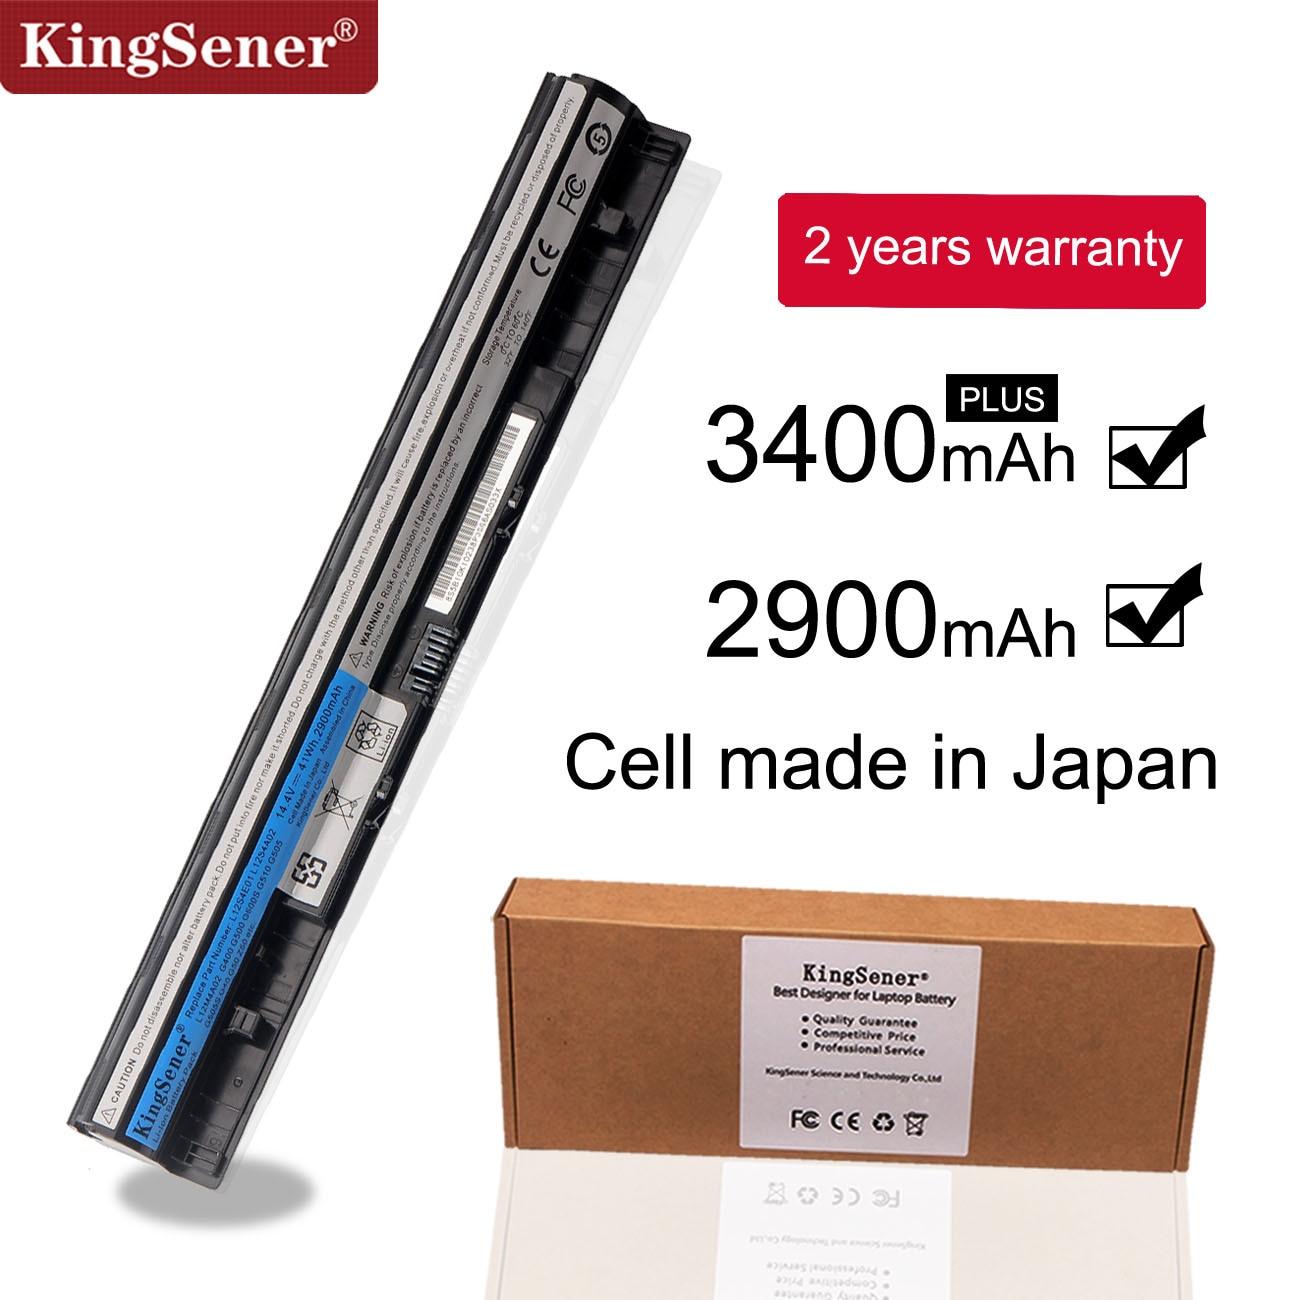 KingSener L12S4E01 L12M4E01 Battery For Lenovo G400S G410S G500 G500S G510S G405S G505S S510P Z710 L12L4A02 L12L4E01 L12S4A02